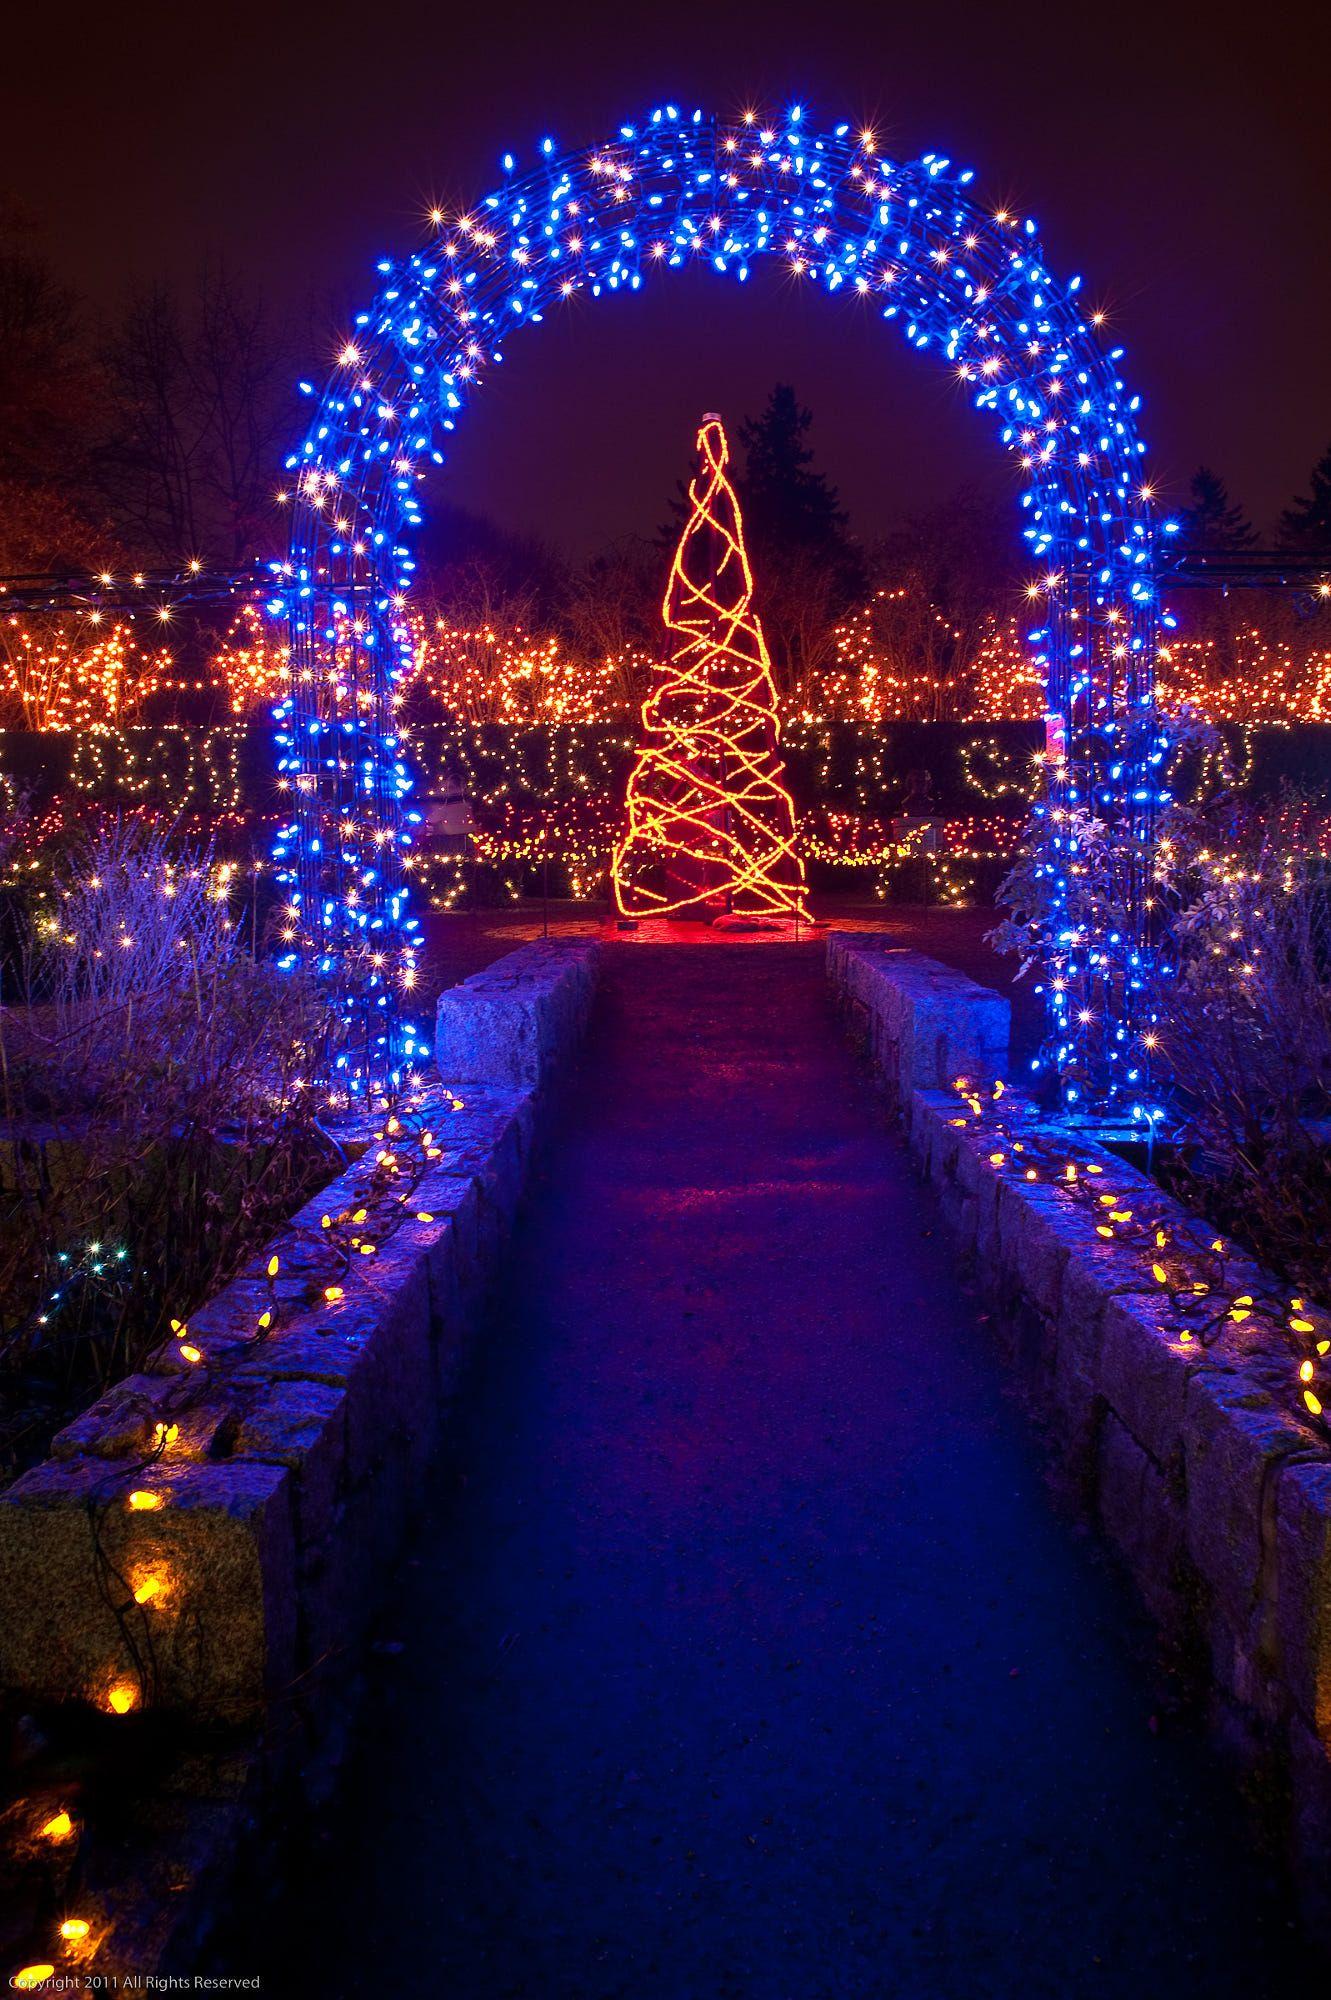 582aea09e6a5c68d8a82e6704b2c2124 - Van Dusen Botanical Gardens Christmas Lights